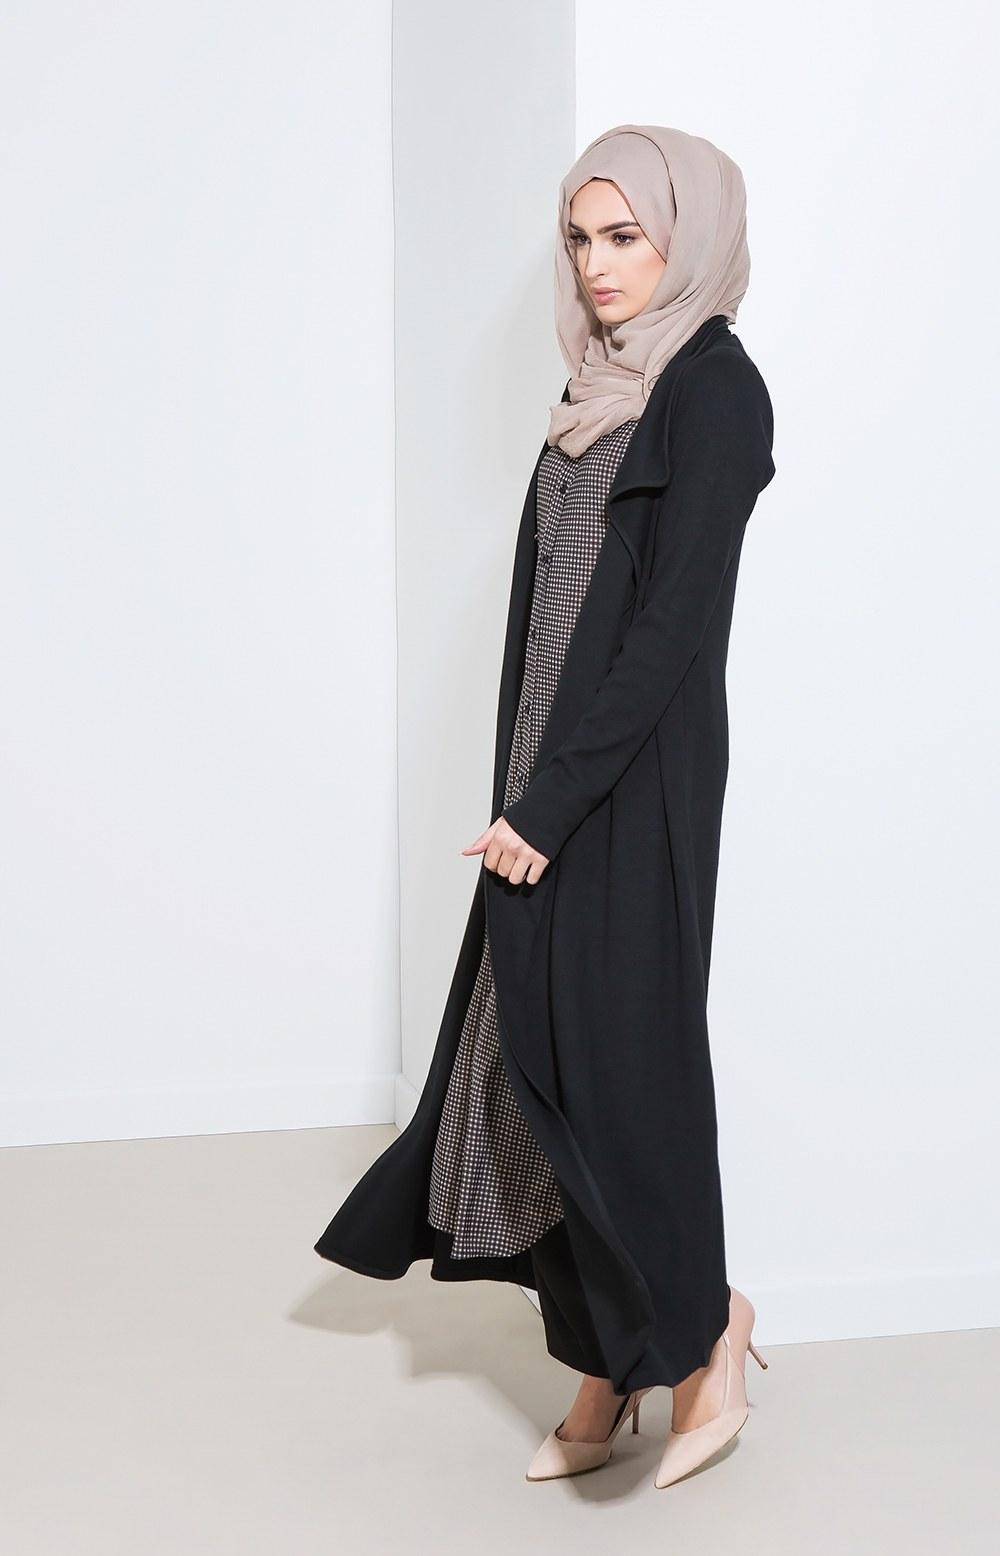 Design Baju Lebaran 2017 8ydm 25 Trend Model Baju Muslim Lebaran 2018 Simple & Modis